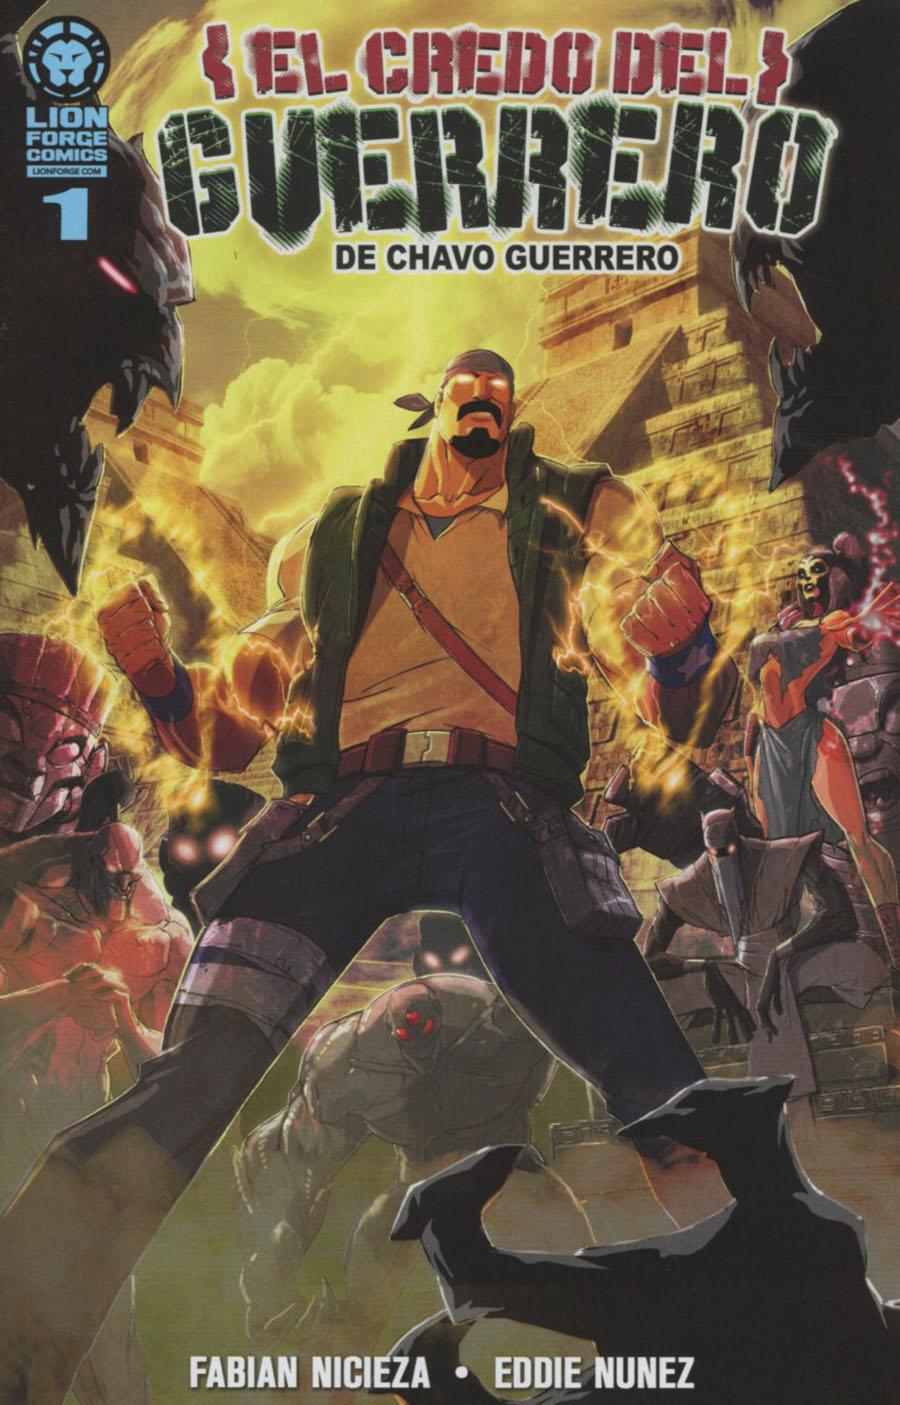 Chavo Guerreros Warriors Creed #1 Spanish Edition